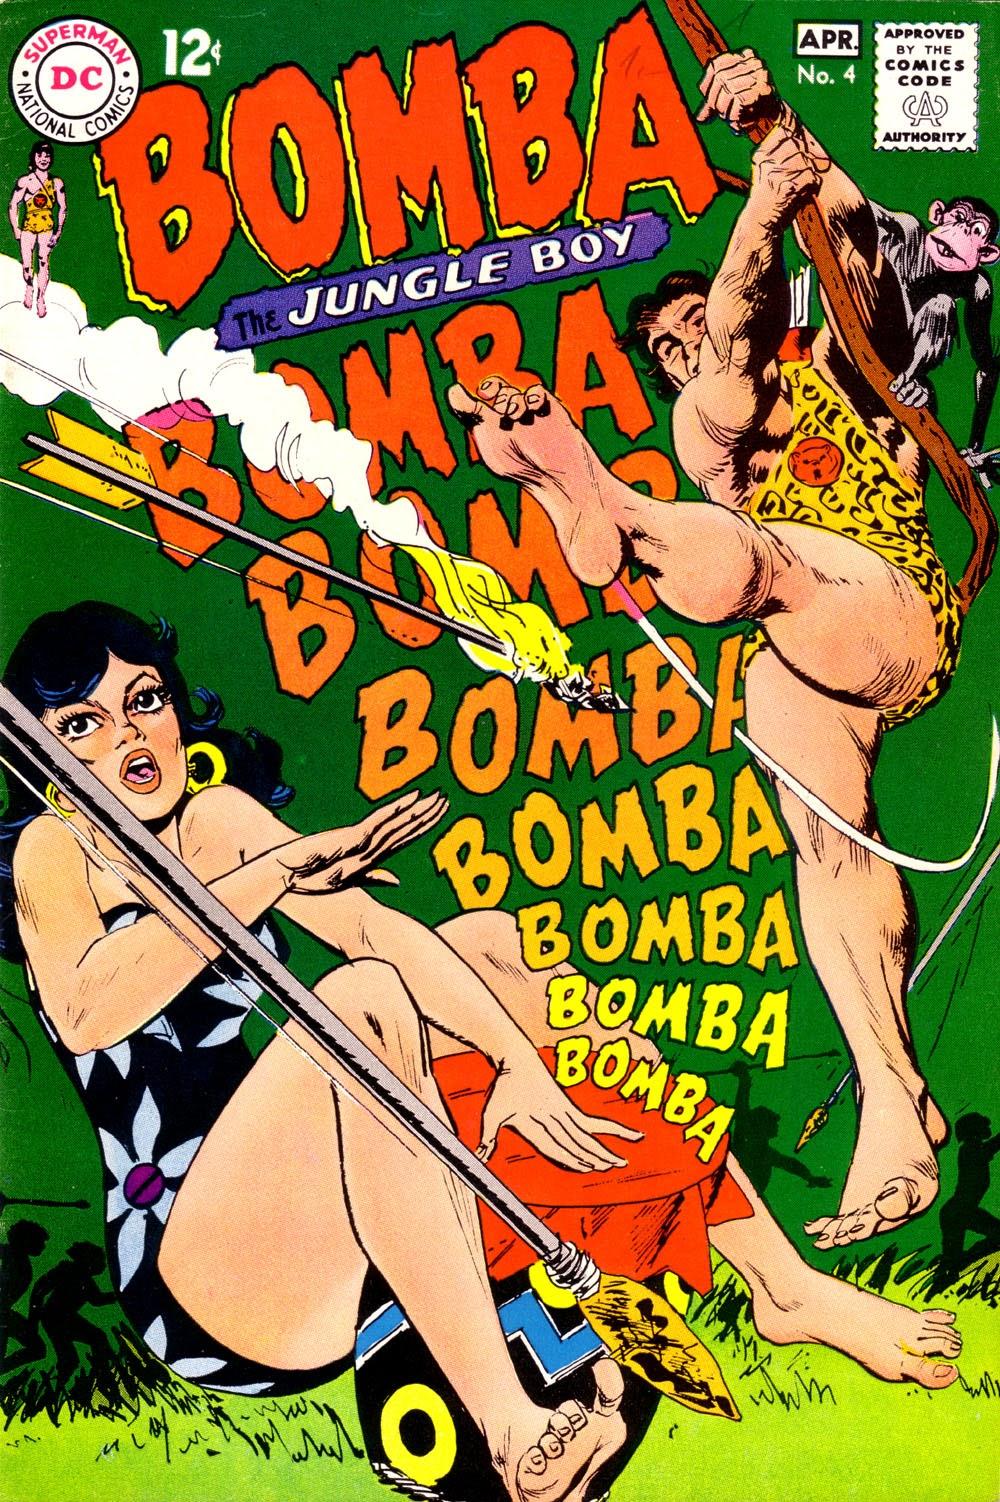 Bomba, The Jungle Boy 4 Page 1